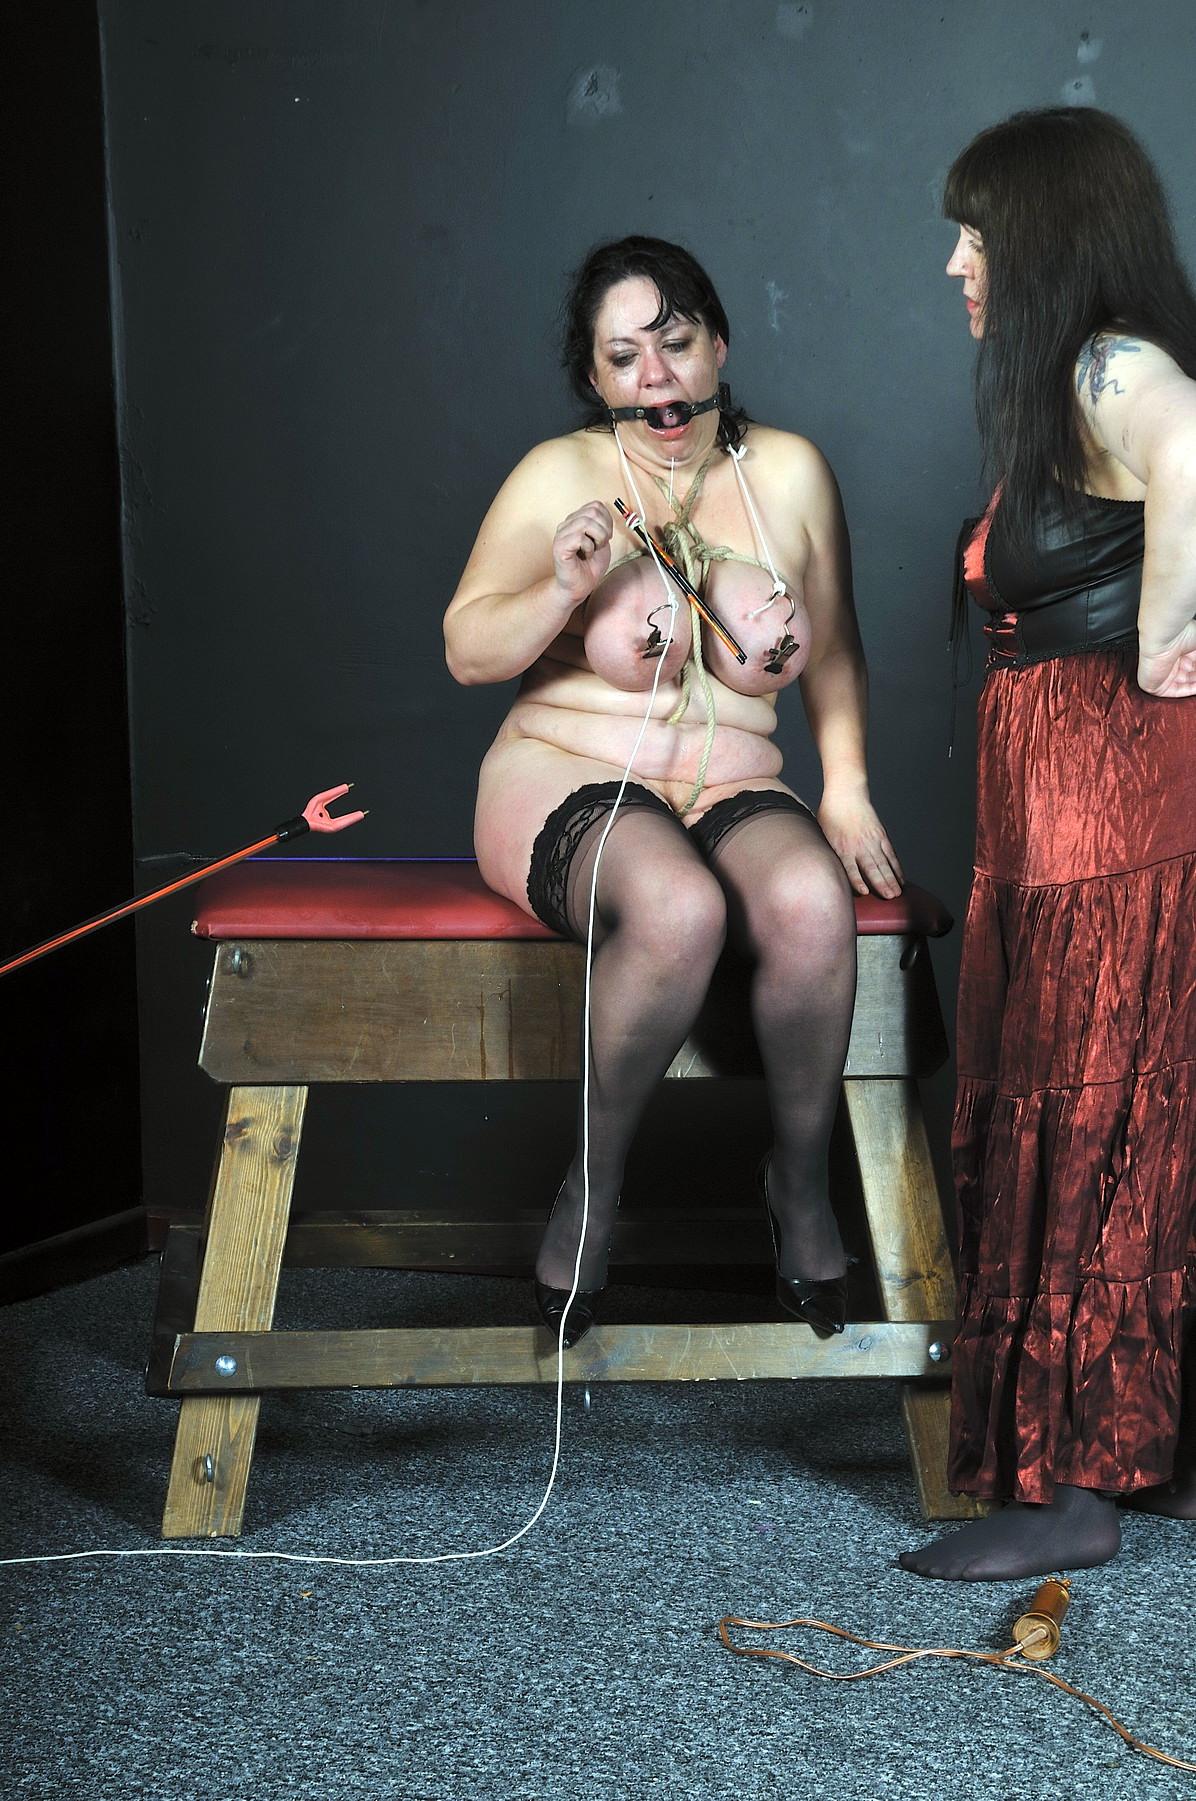 Bbw lesbian slave Legal Babes